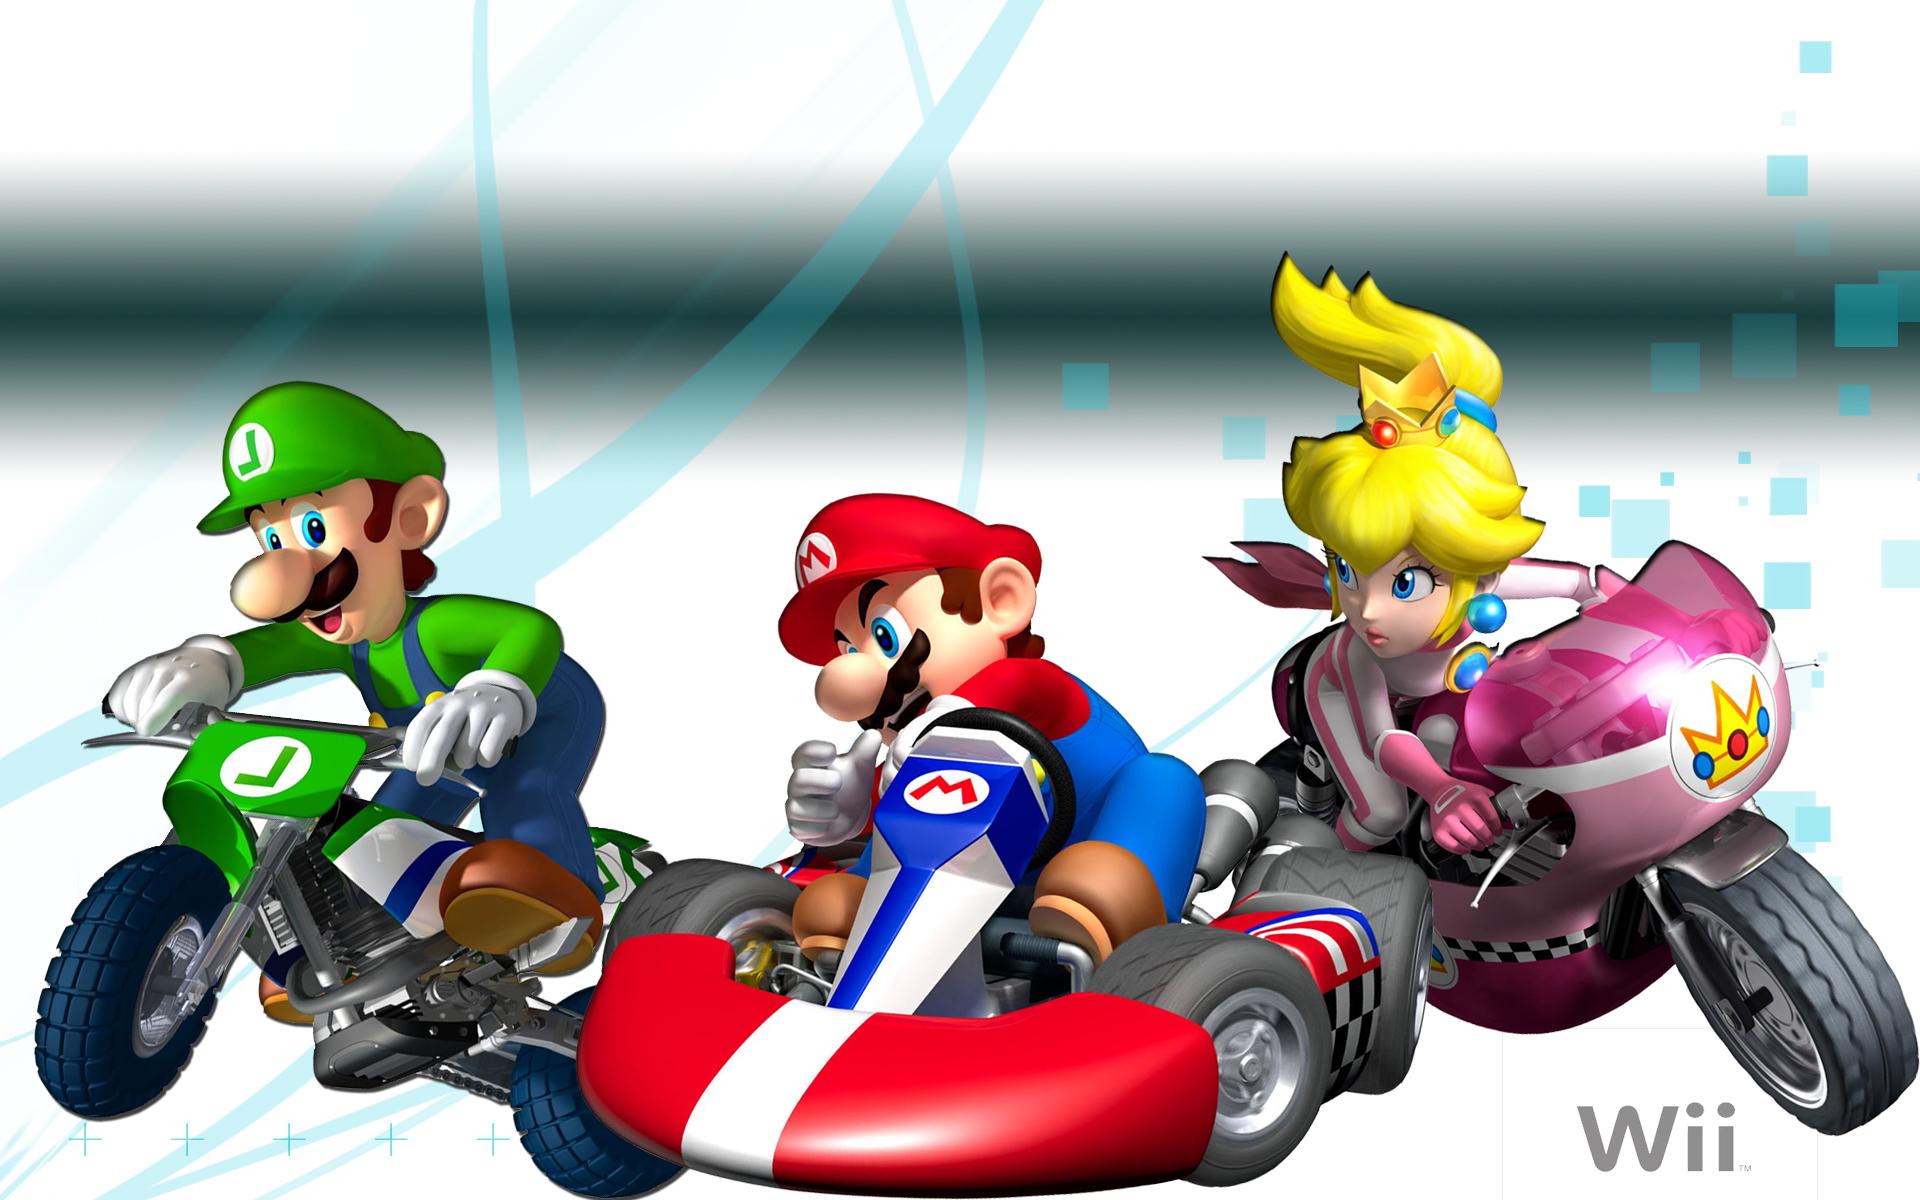 Mario Kart Wii Hd Wallpaper Background Image 1920x1200